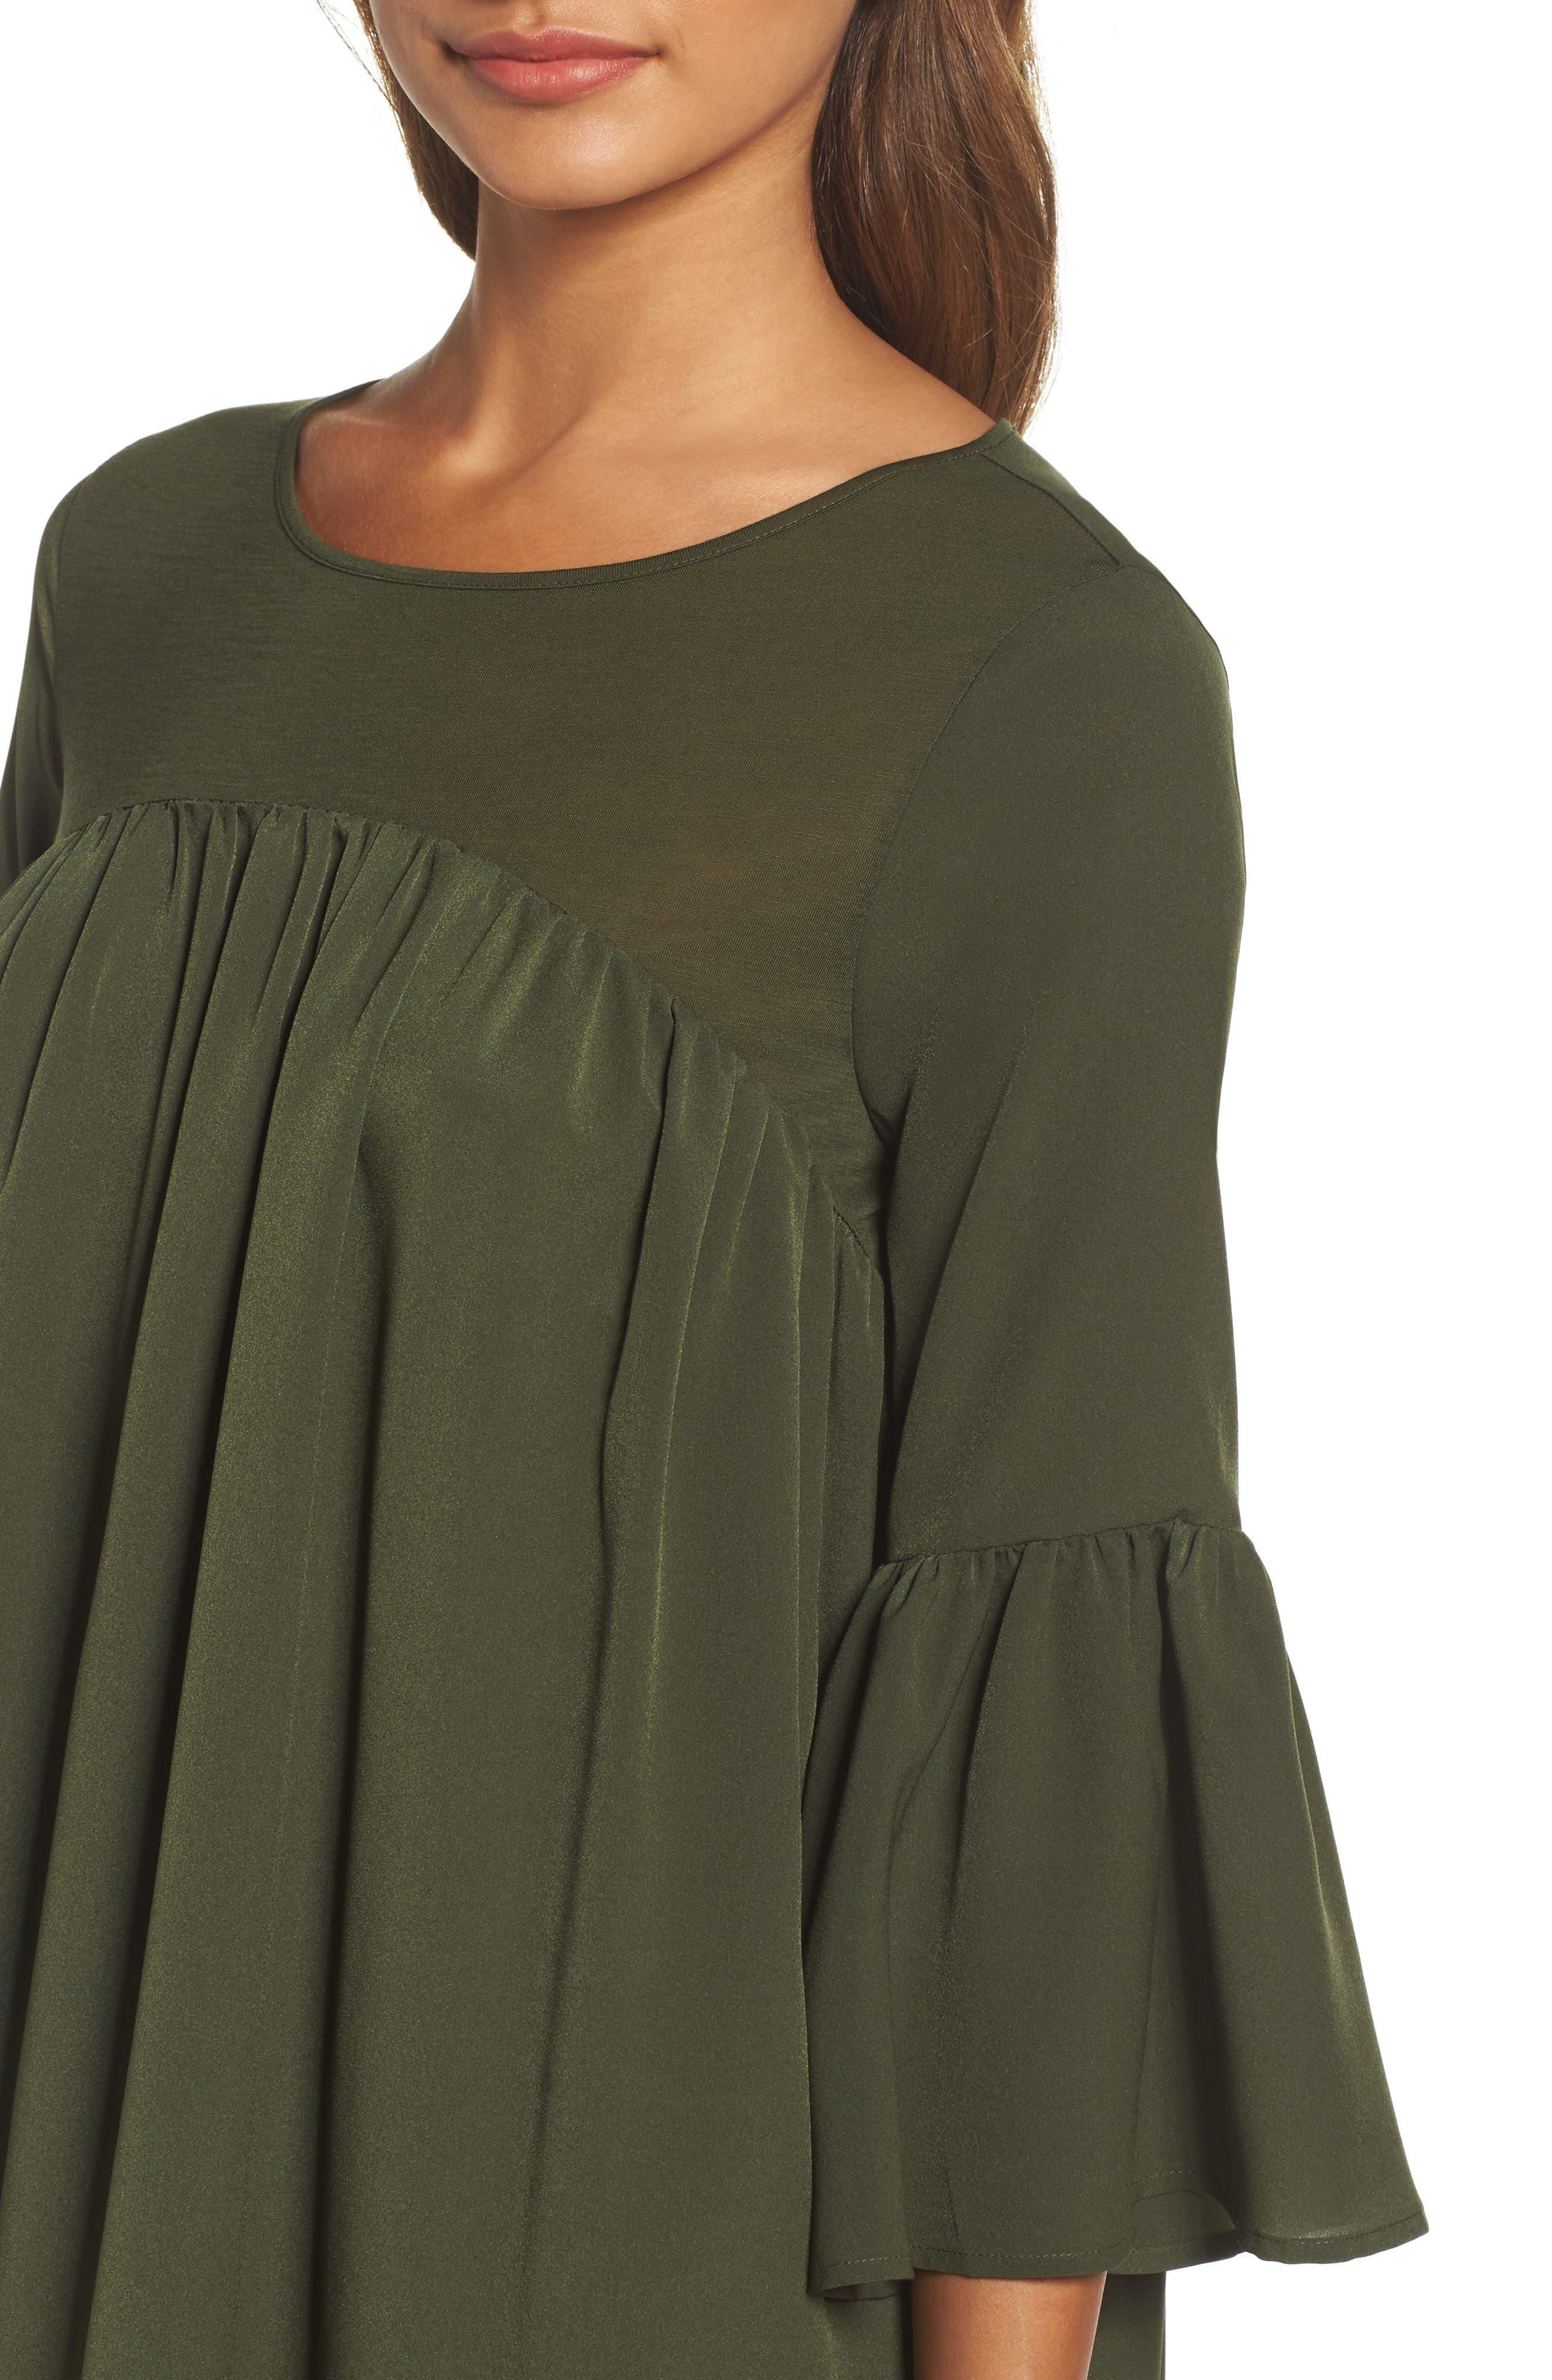 Polly Plains Shift Dress,                             Alternate thumbnail 8, color,